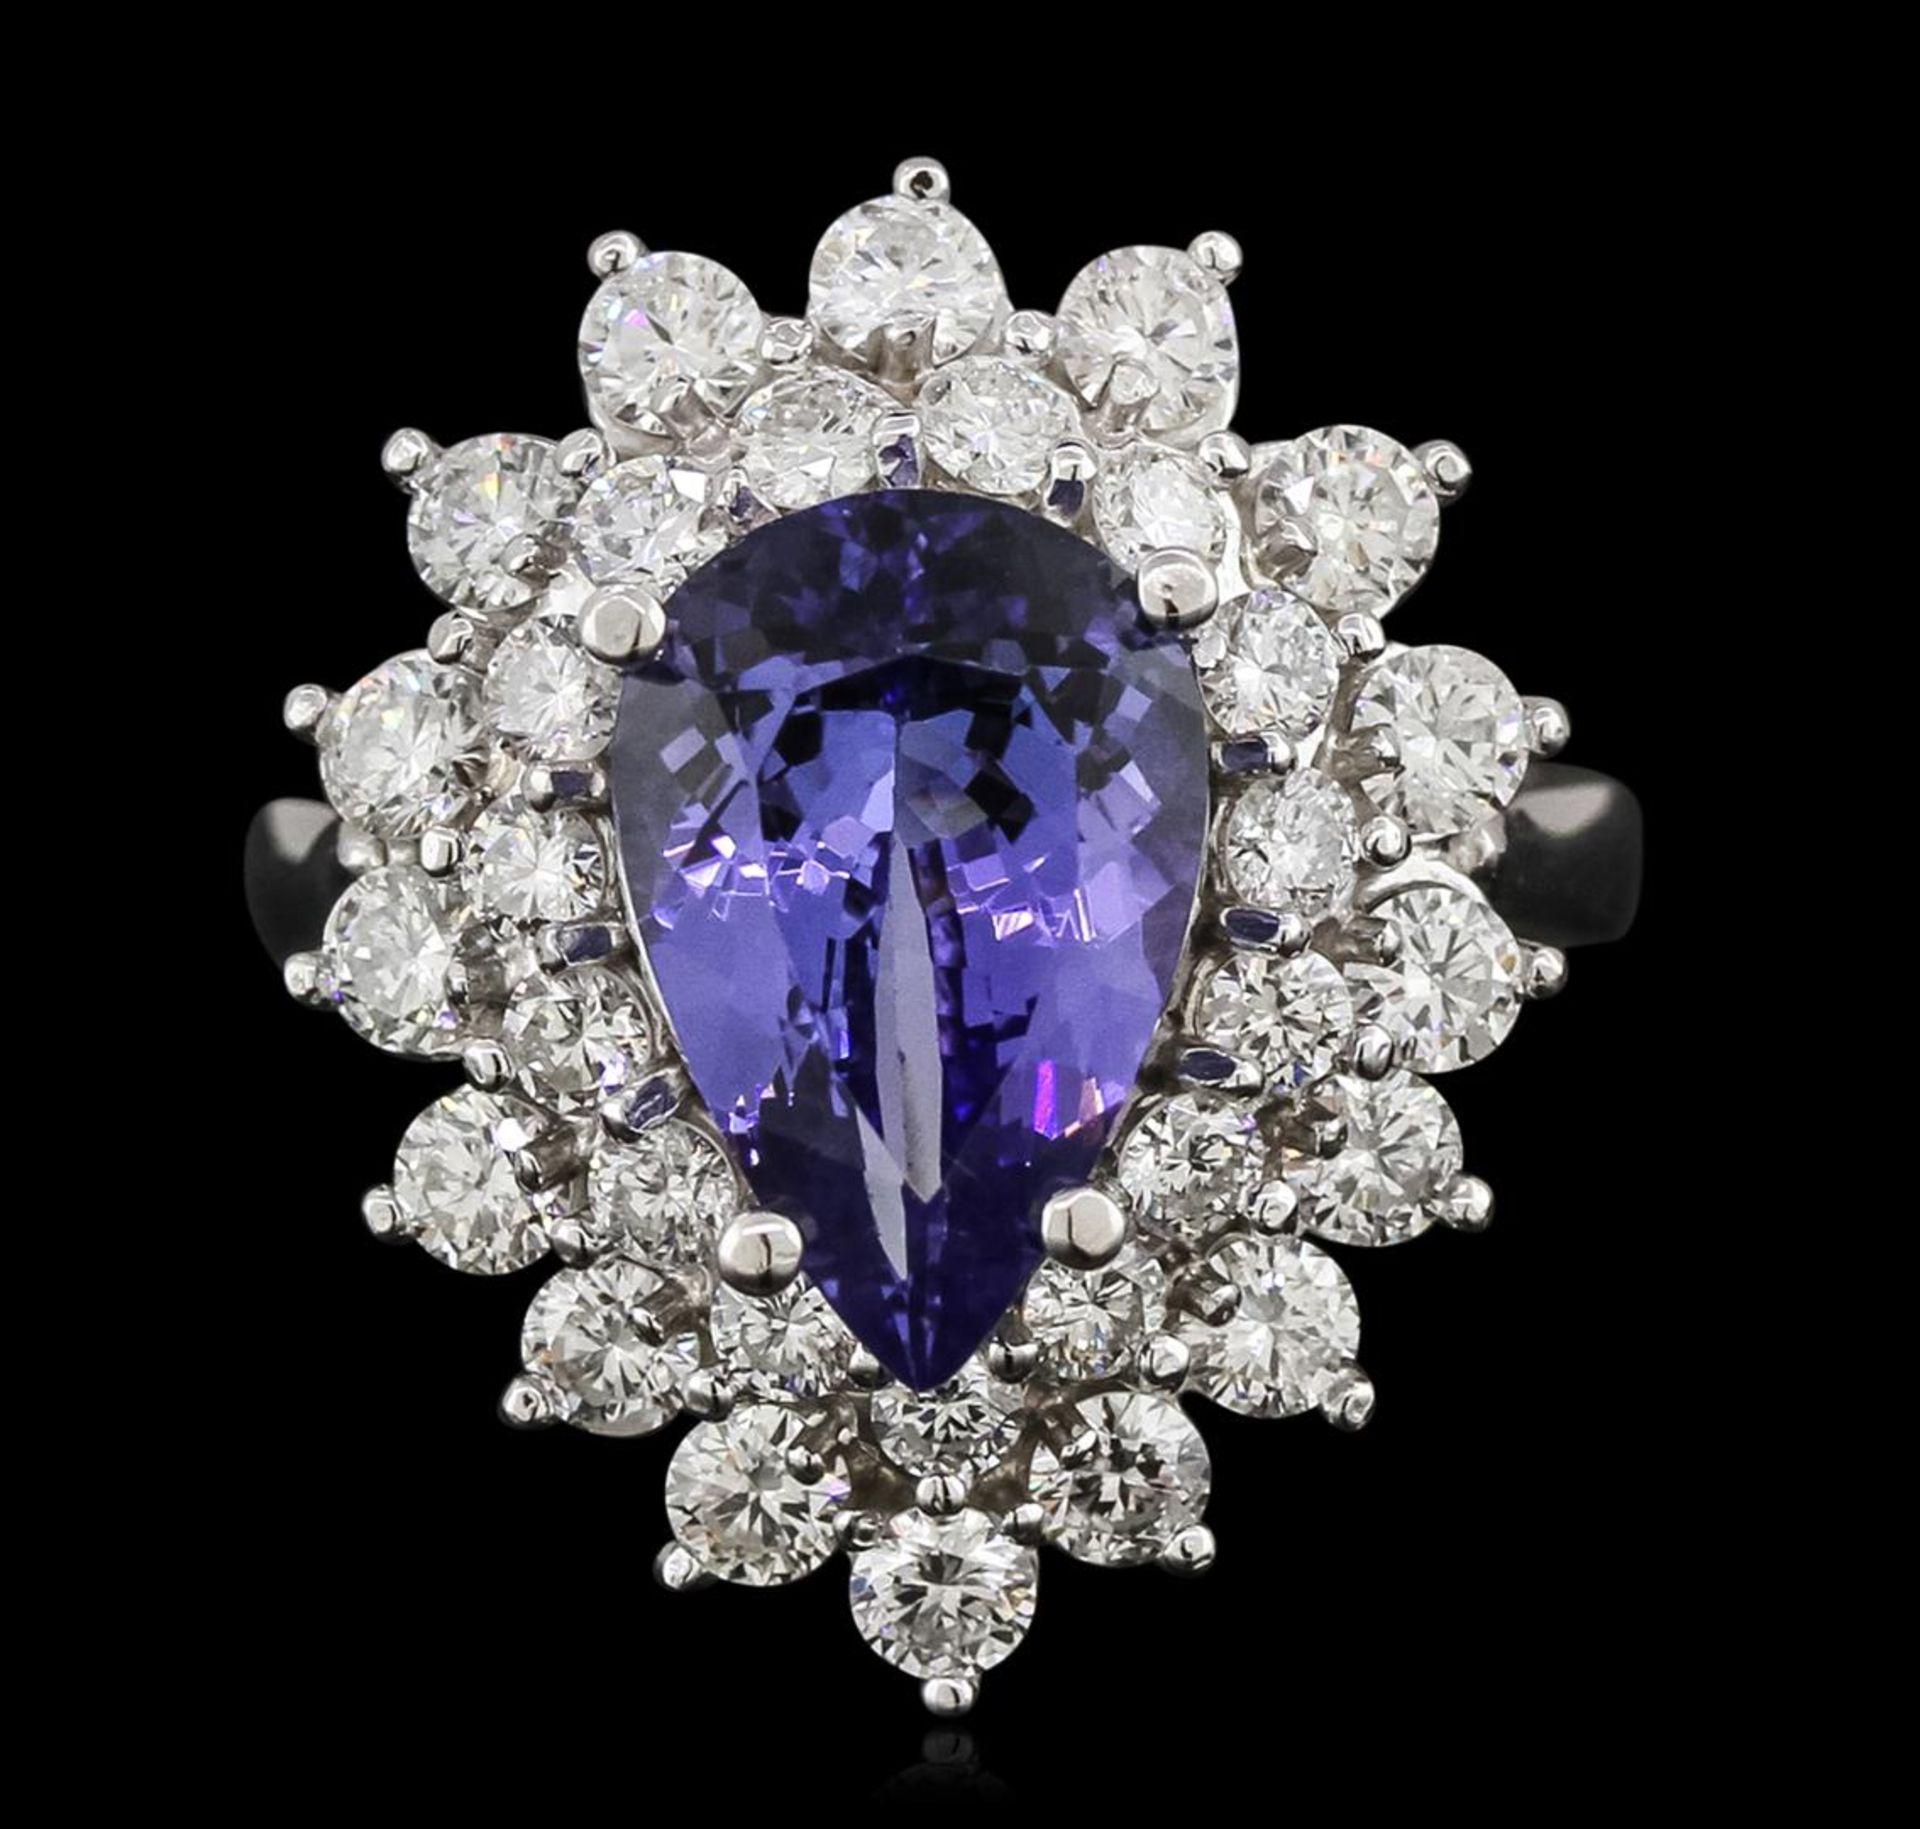 14KT White Gold 3.69 ctw Tanzanite and Diamond Ring - Image 2 of 3